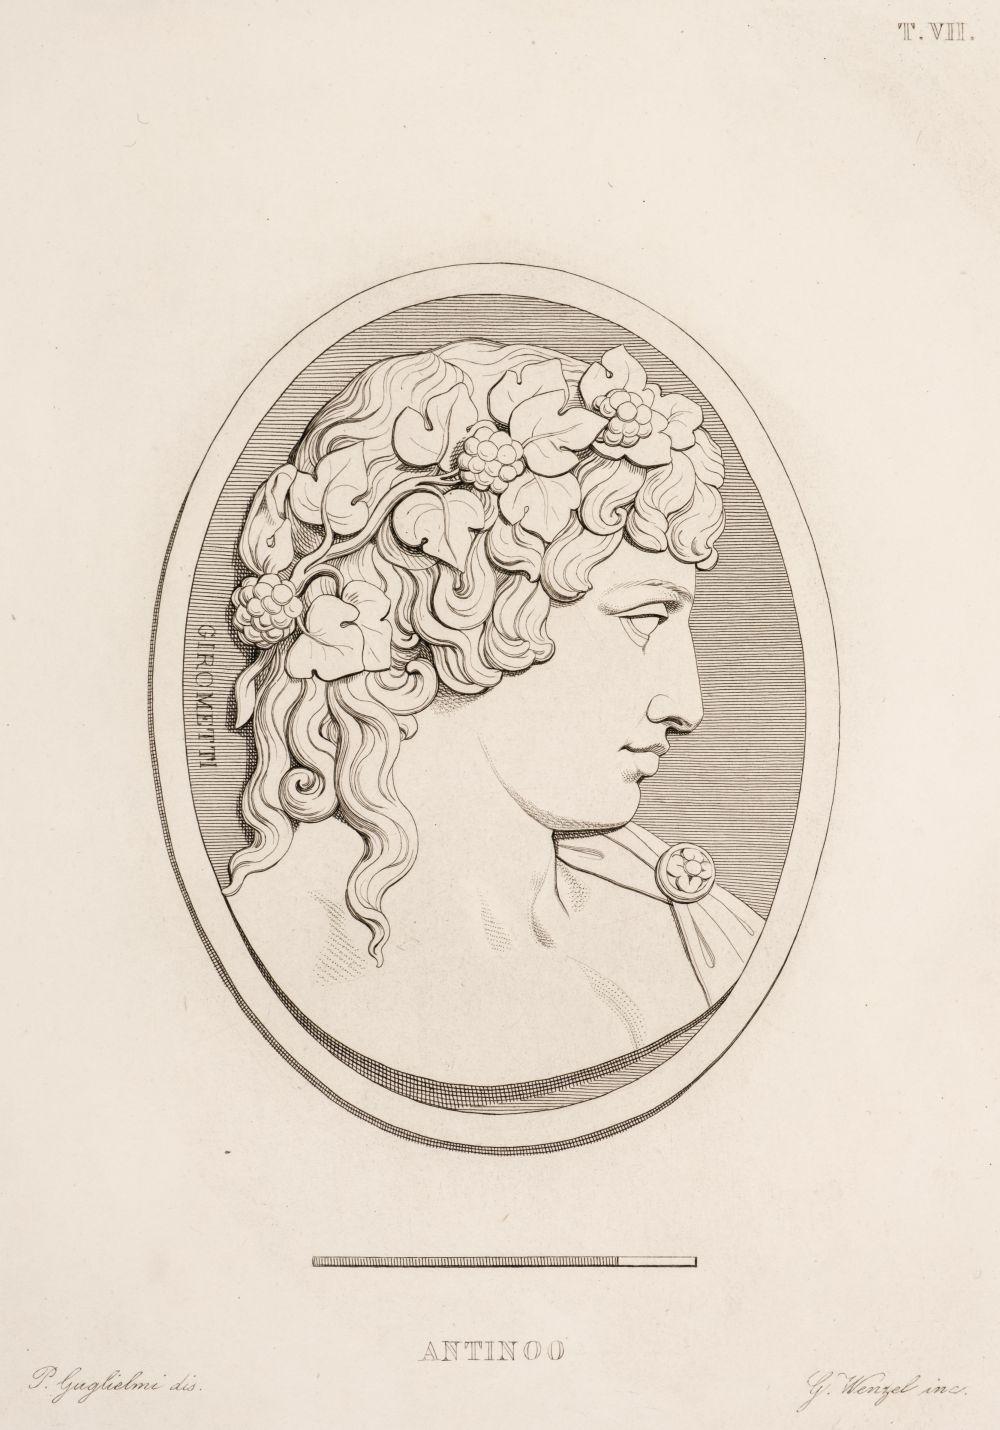 Girometti (Giuseppe). Gemme incise dal cavaliere Giuseppe Girometti..., 1836